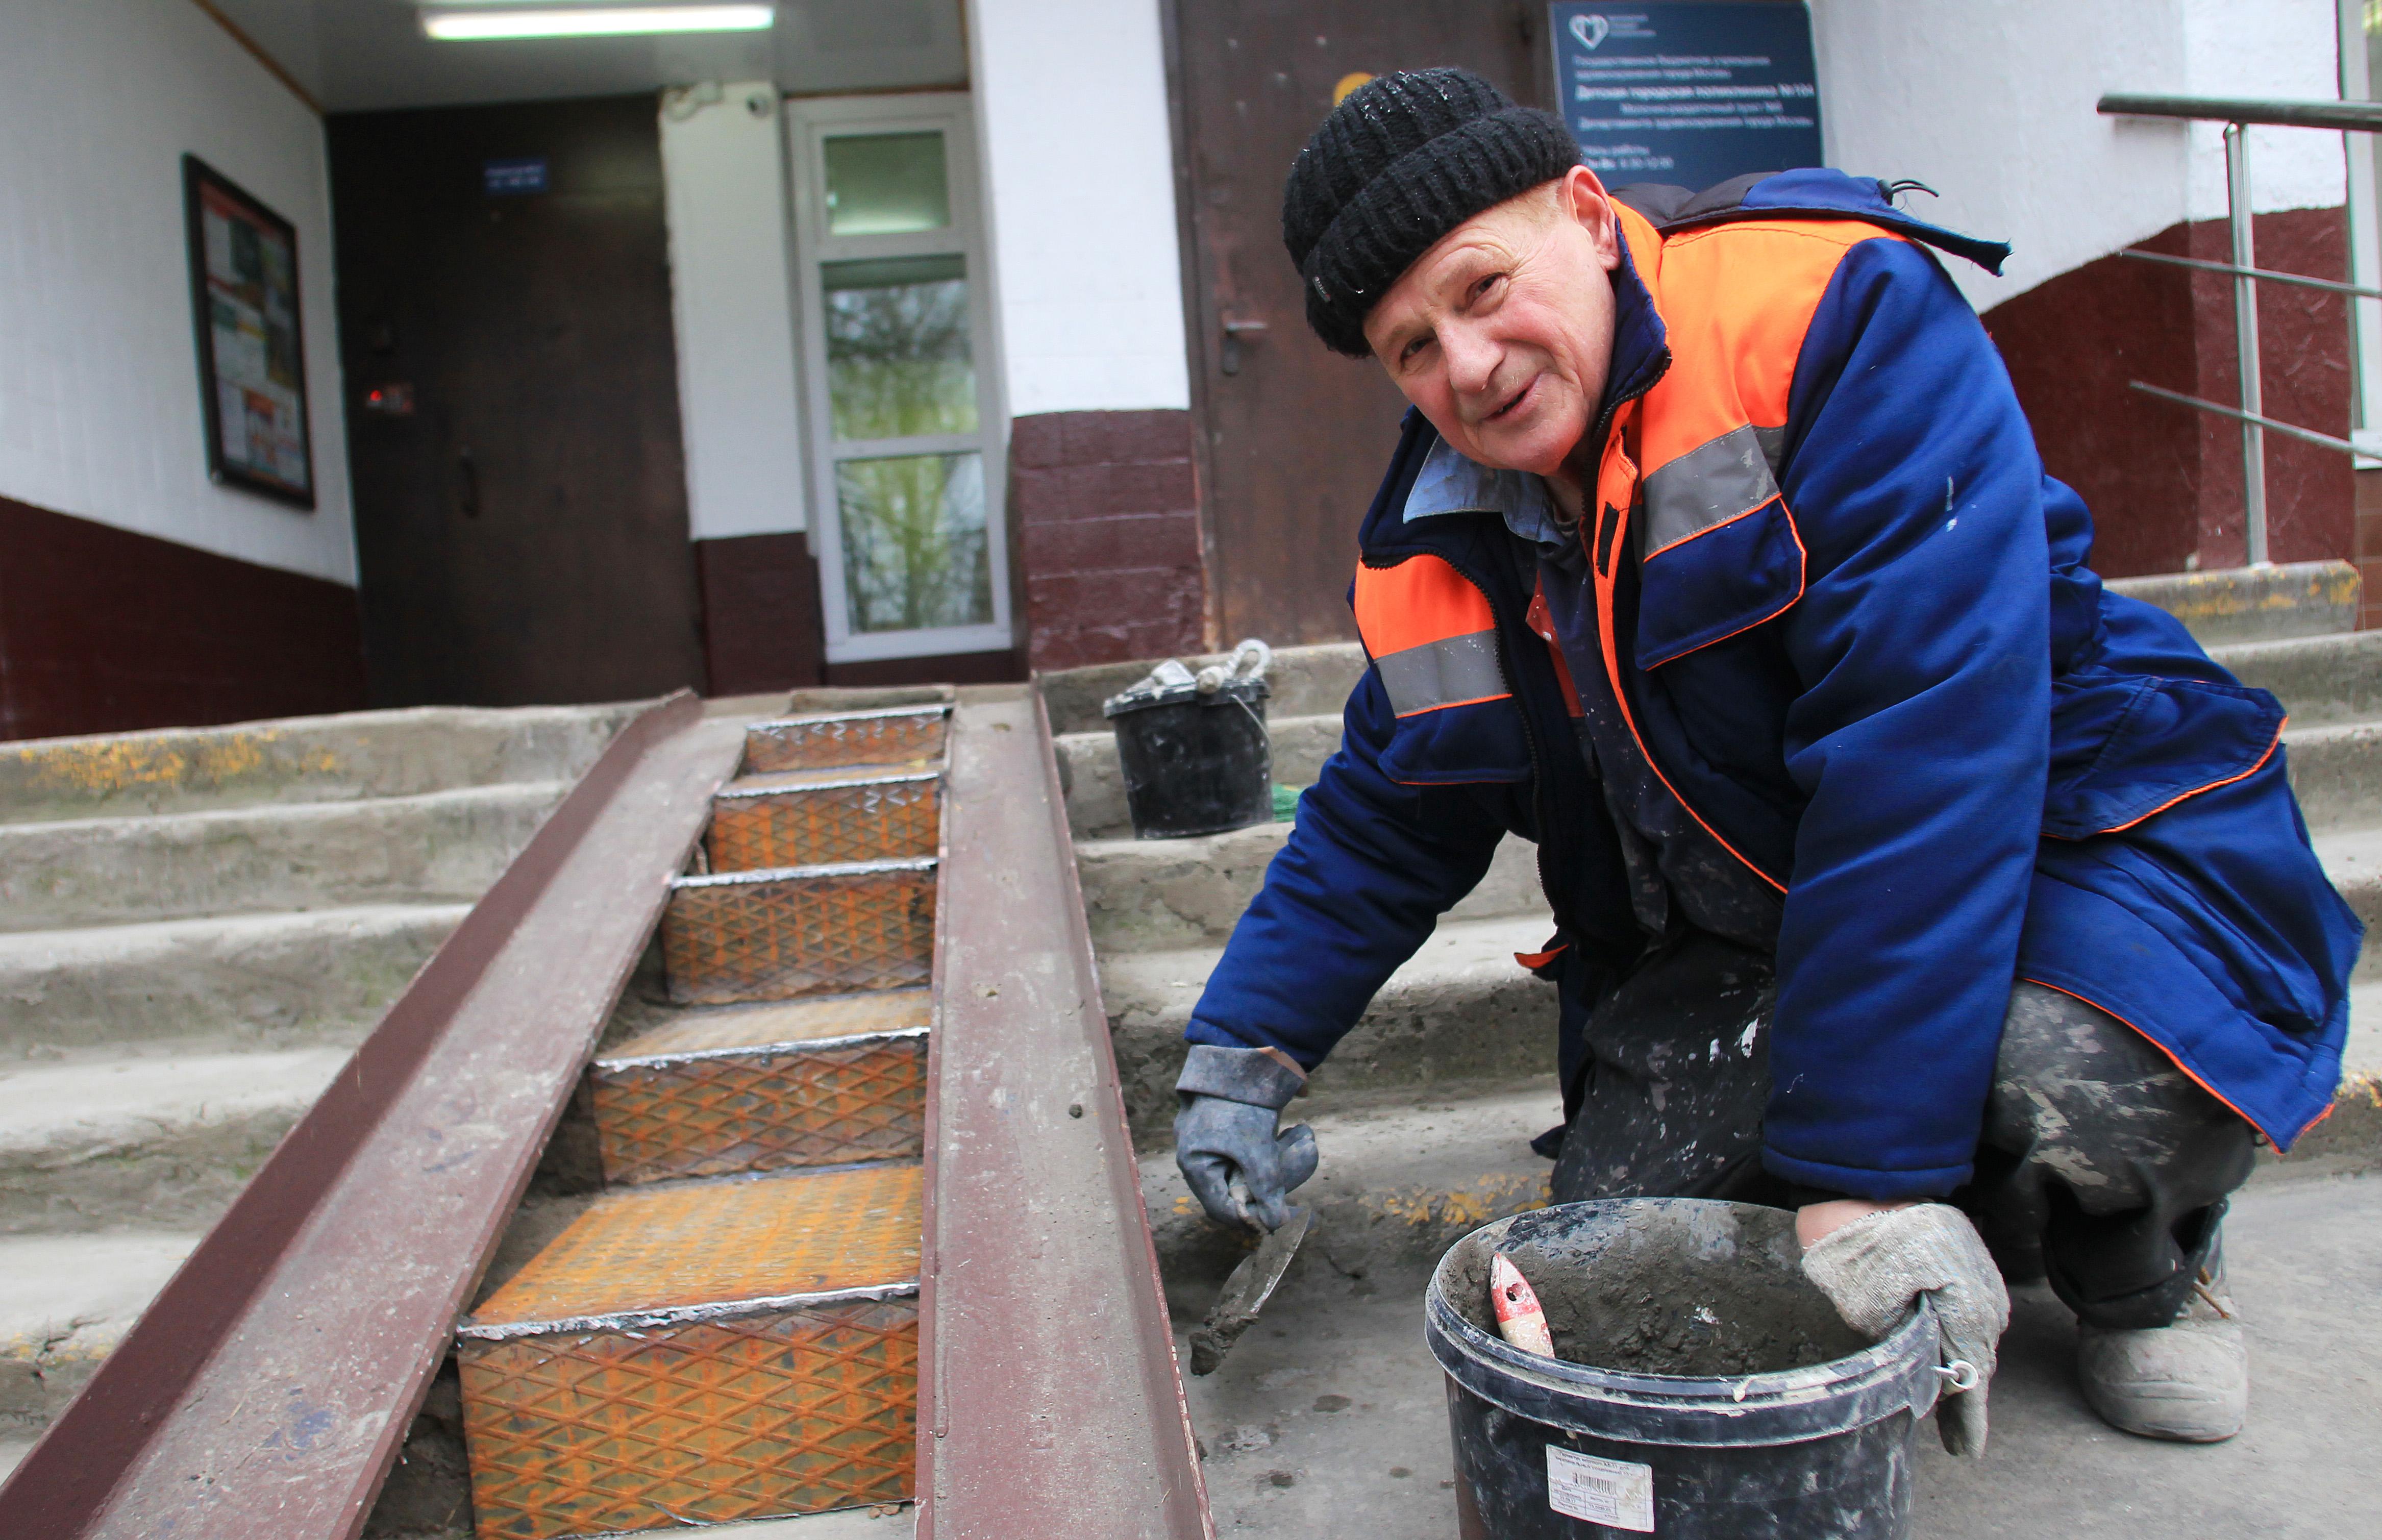 Пандусы установят в многоквартирном жилом доме поселка Ватутинки. Фото: архив, «Вечерняя Москва»